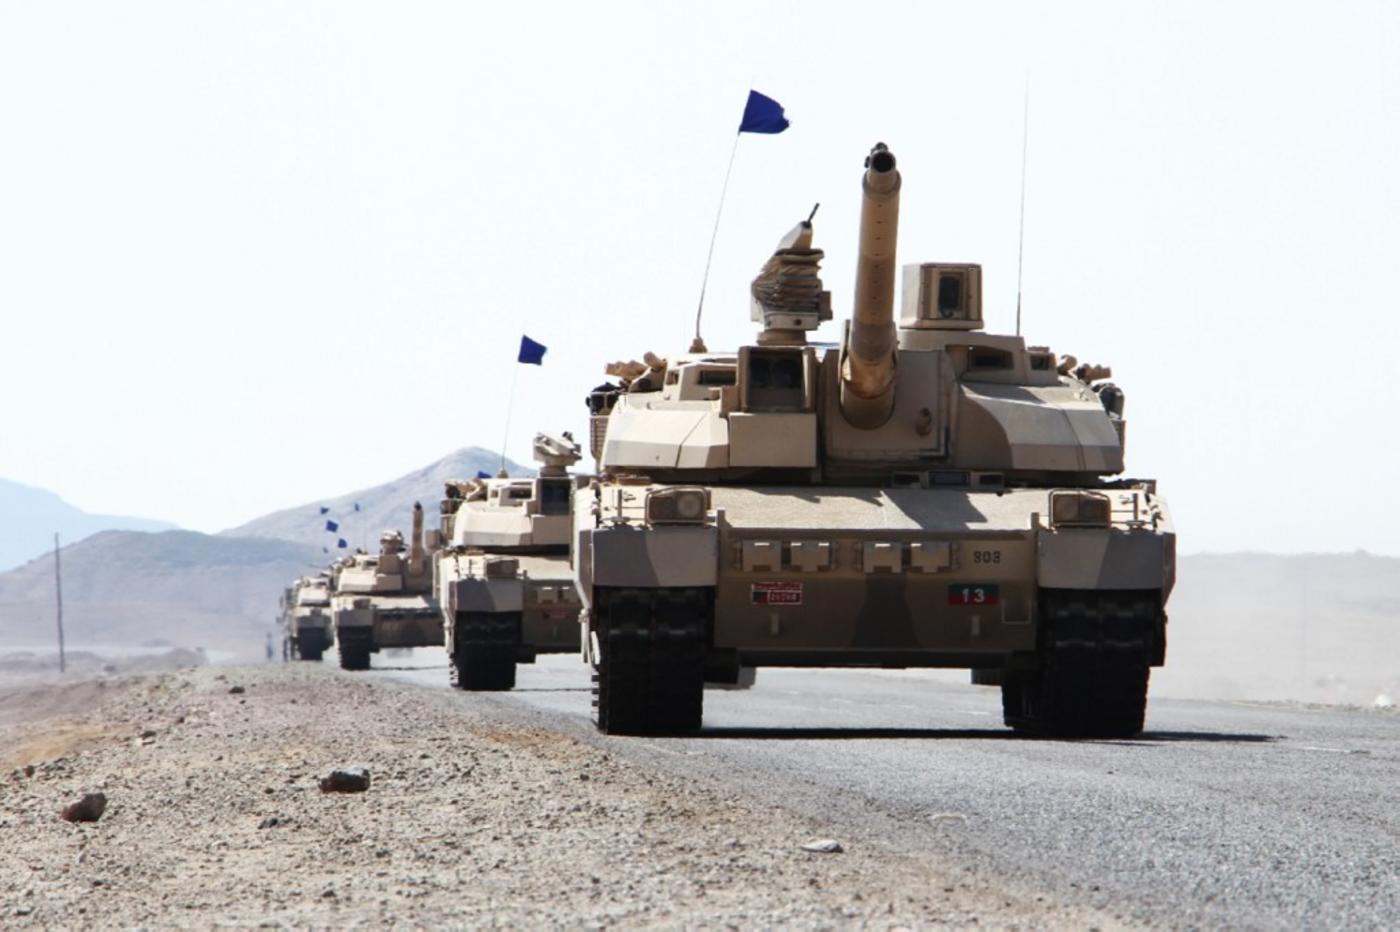 Khashoggi killing: Arab allies back Saudi rejection of U.S report